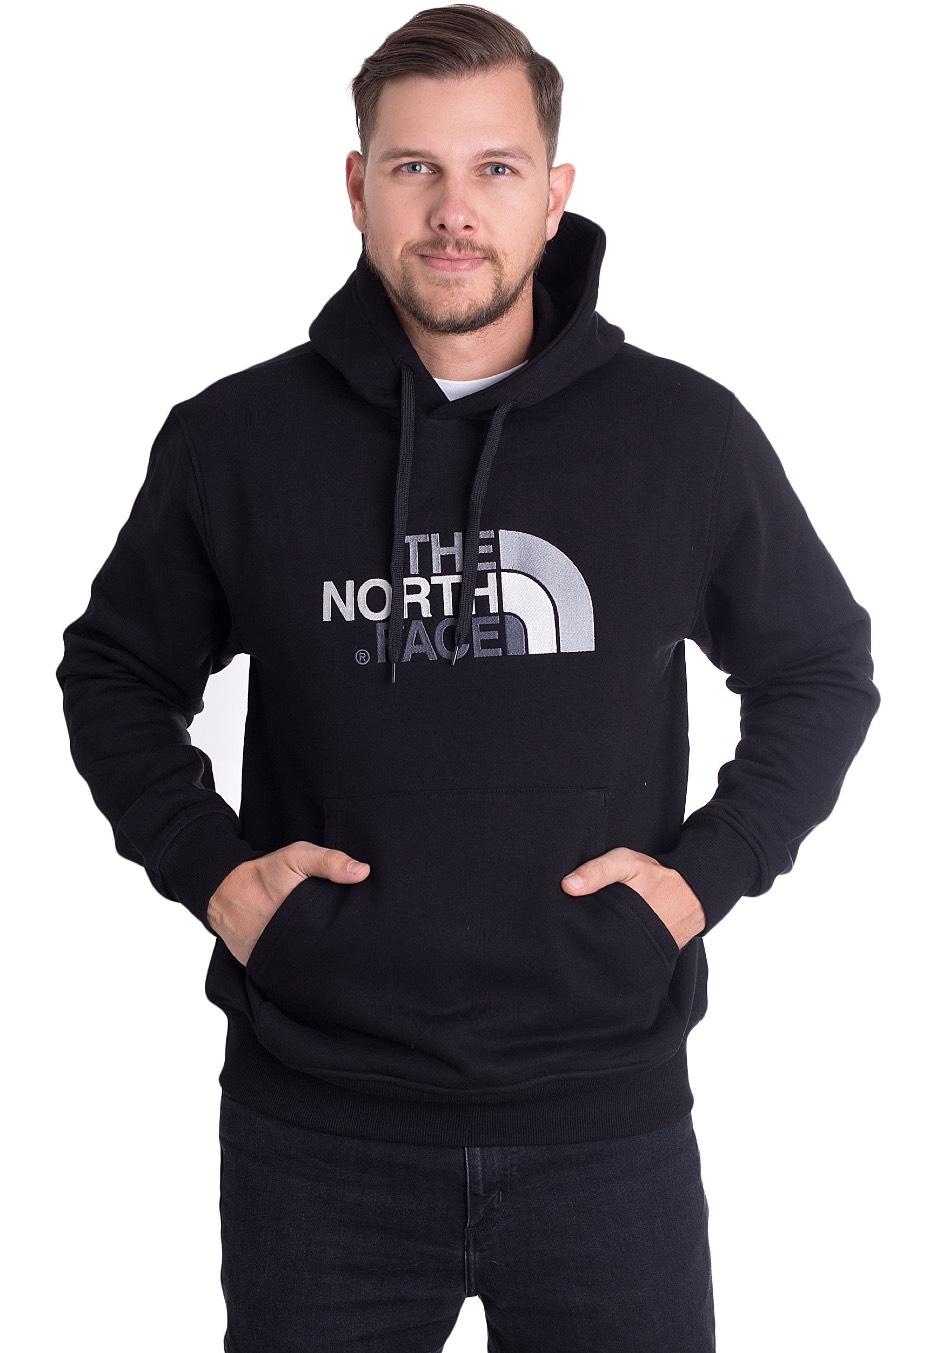 efb56351 The North Face - Drew Peak Black/Black - Hoodie - Streetwear Shop -  Impericon.com UK